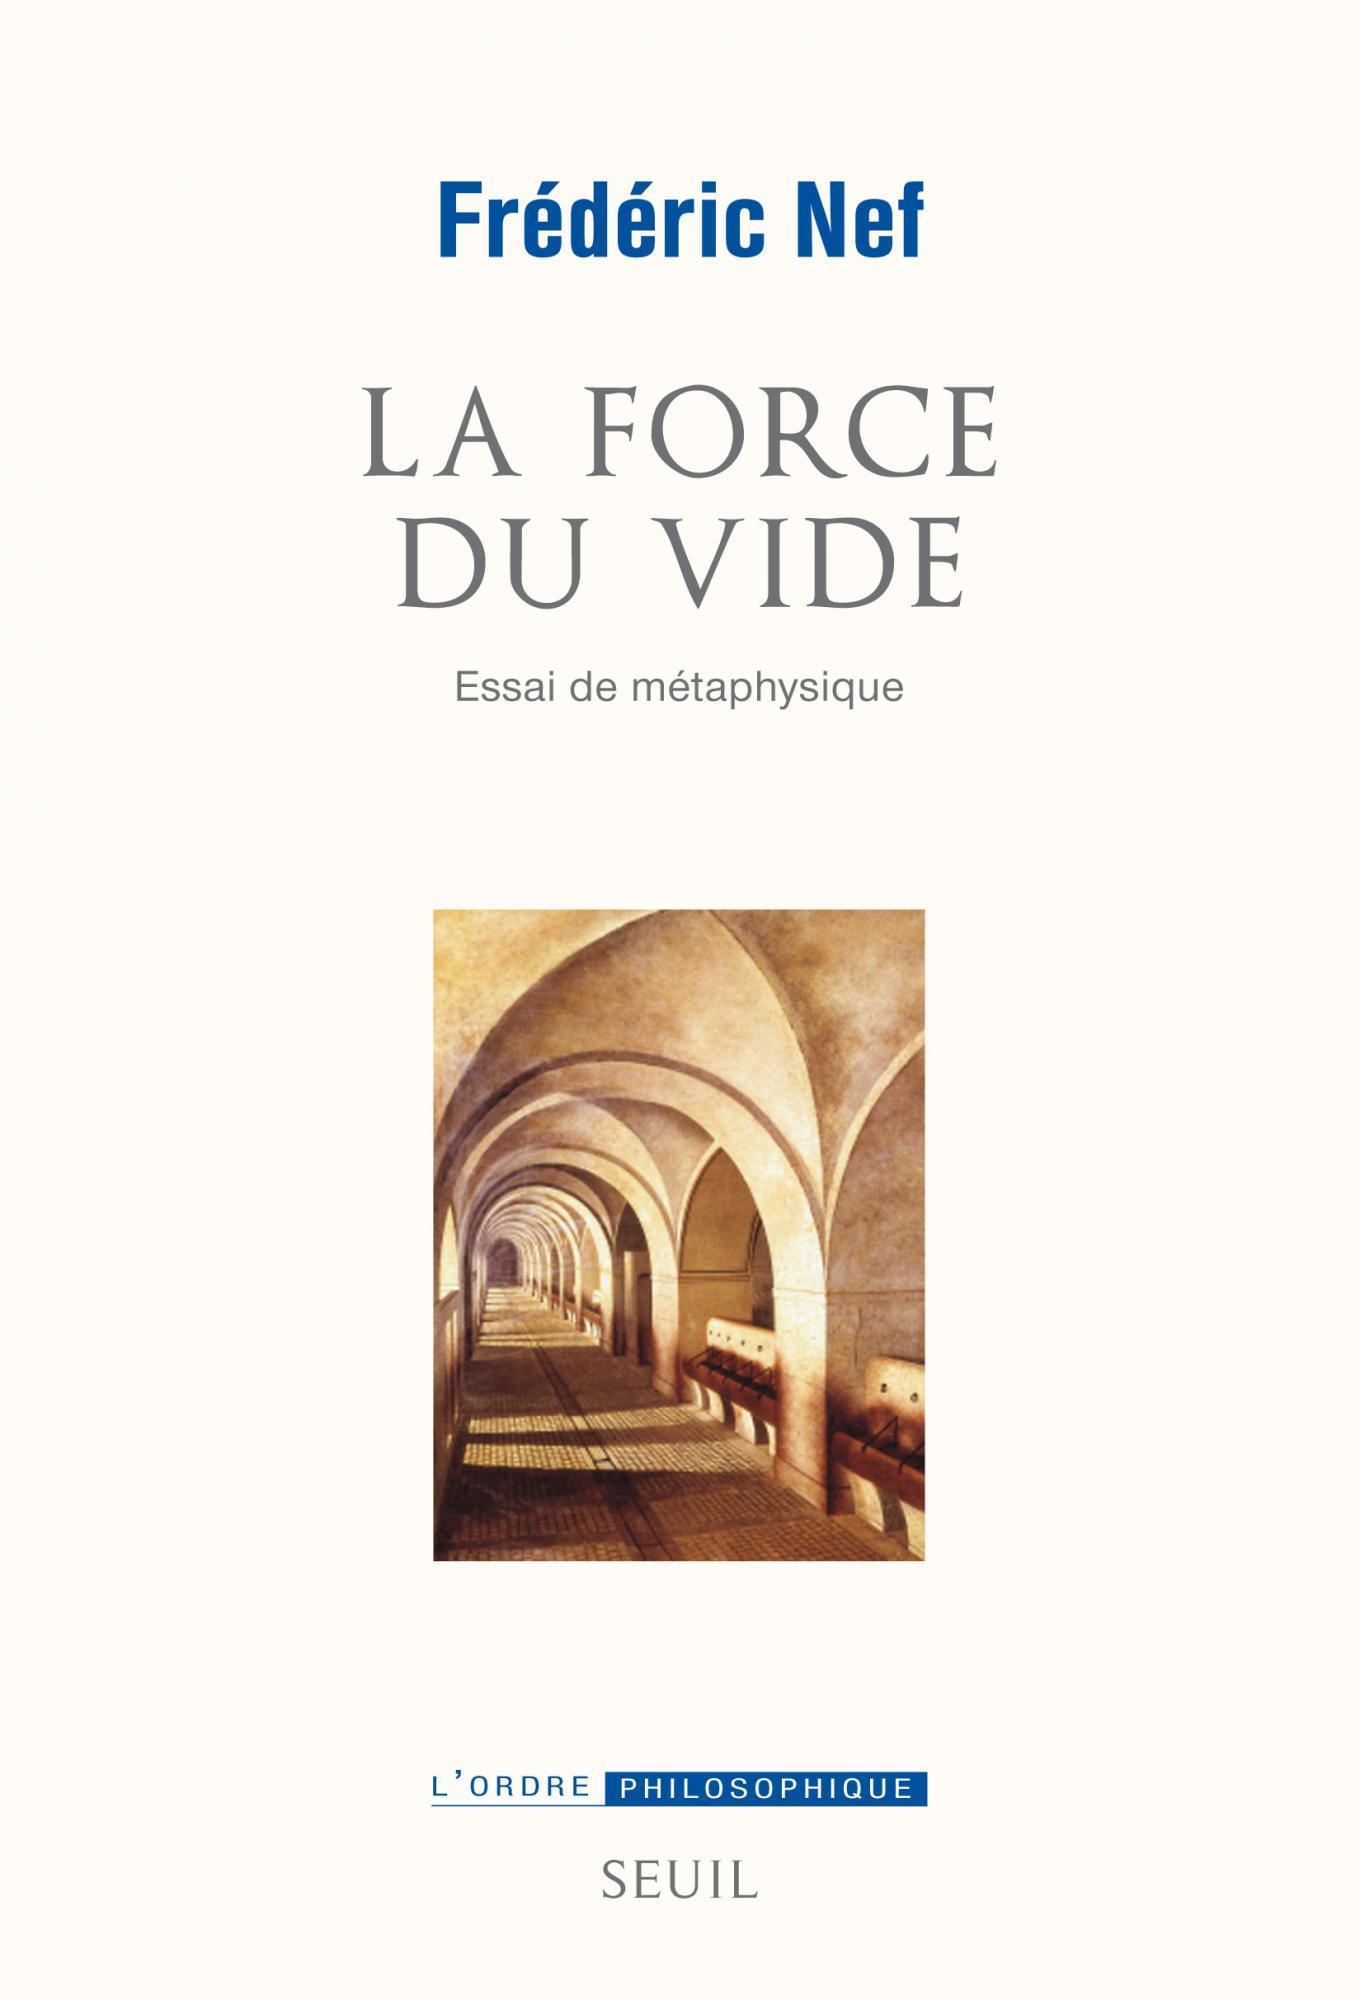 nef_la_force_du_vide.jpg